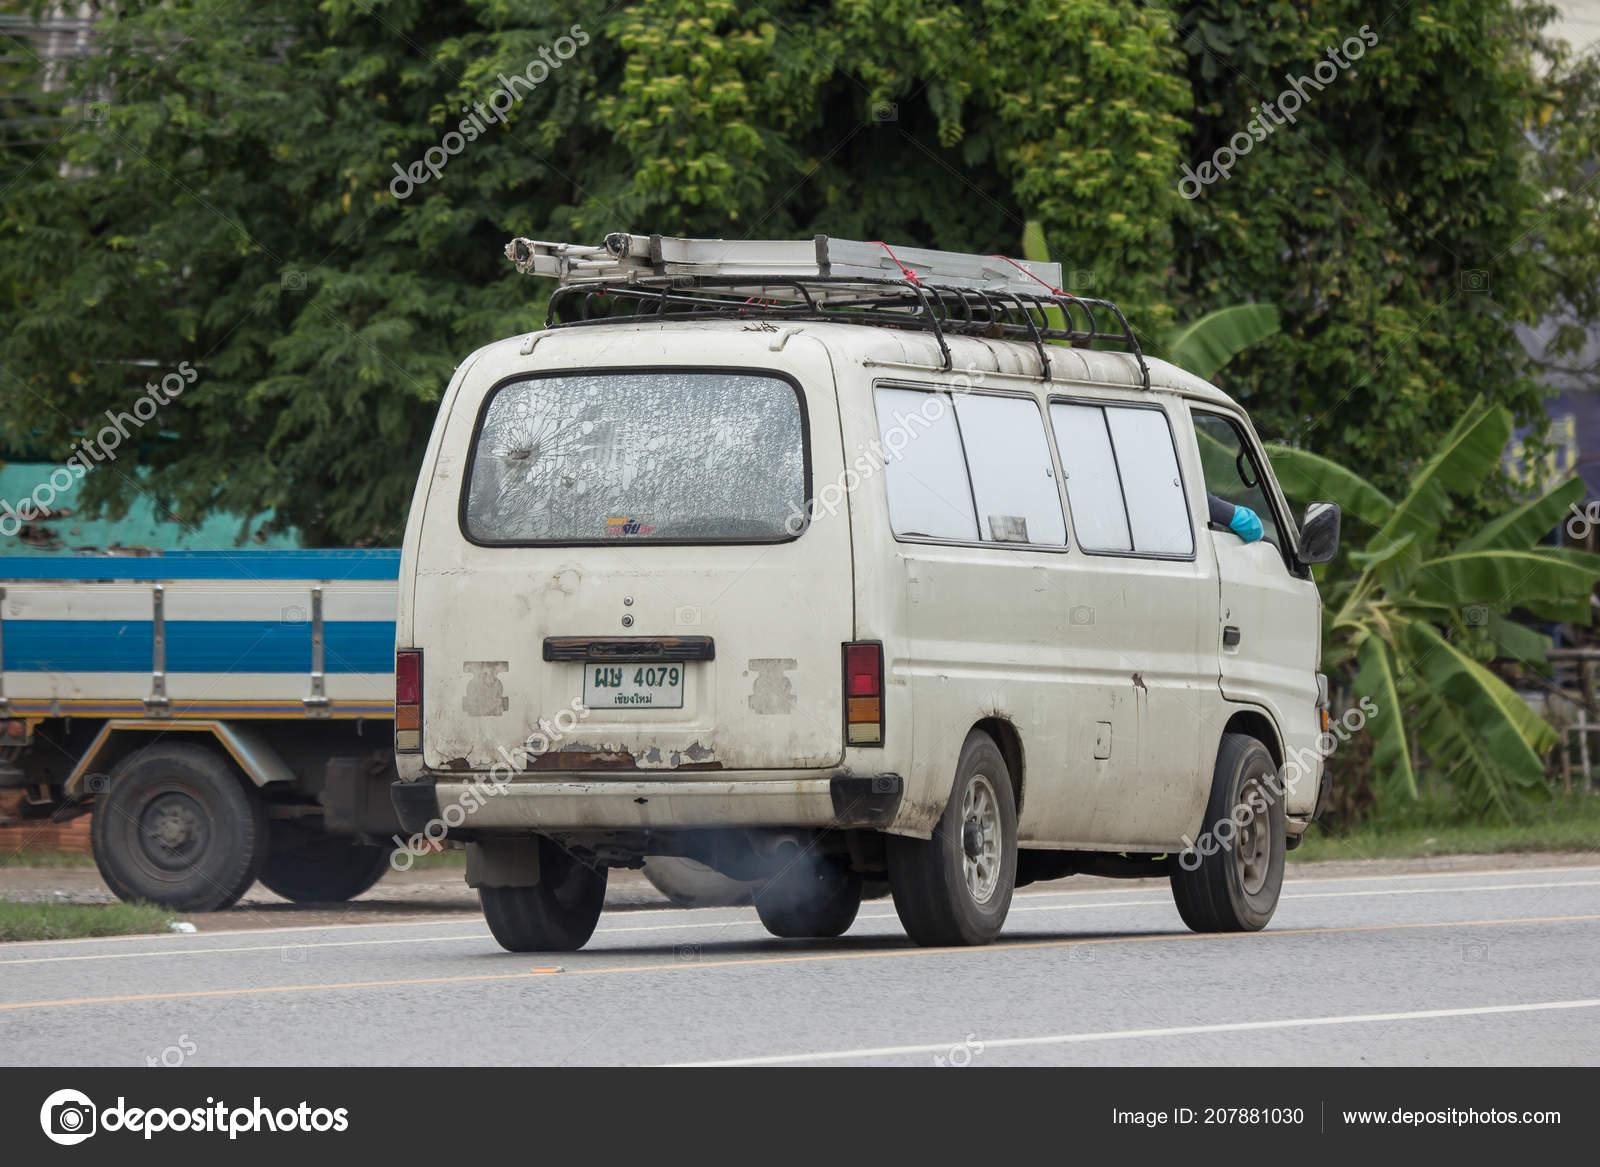 Chiangmai Thailand July 2018 Private Old Isuzu Elf Van Photo – Stock